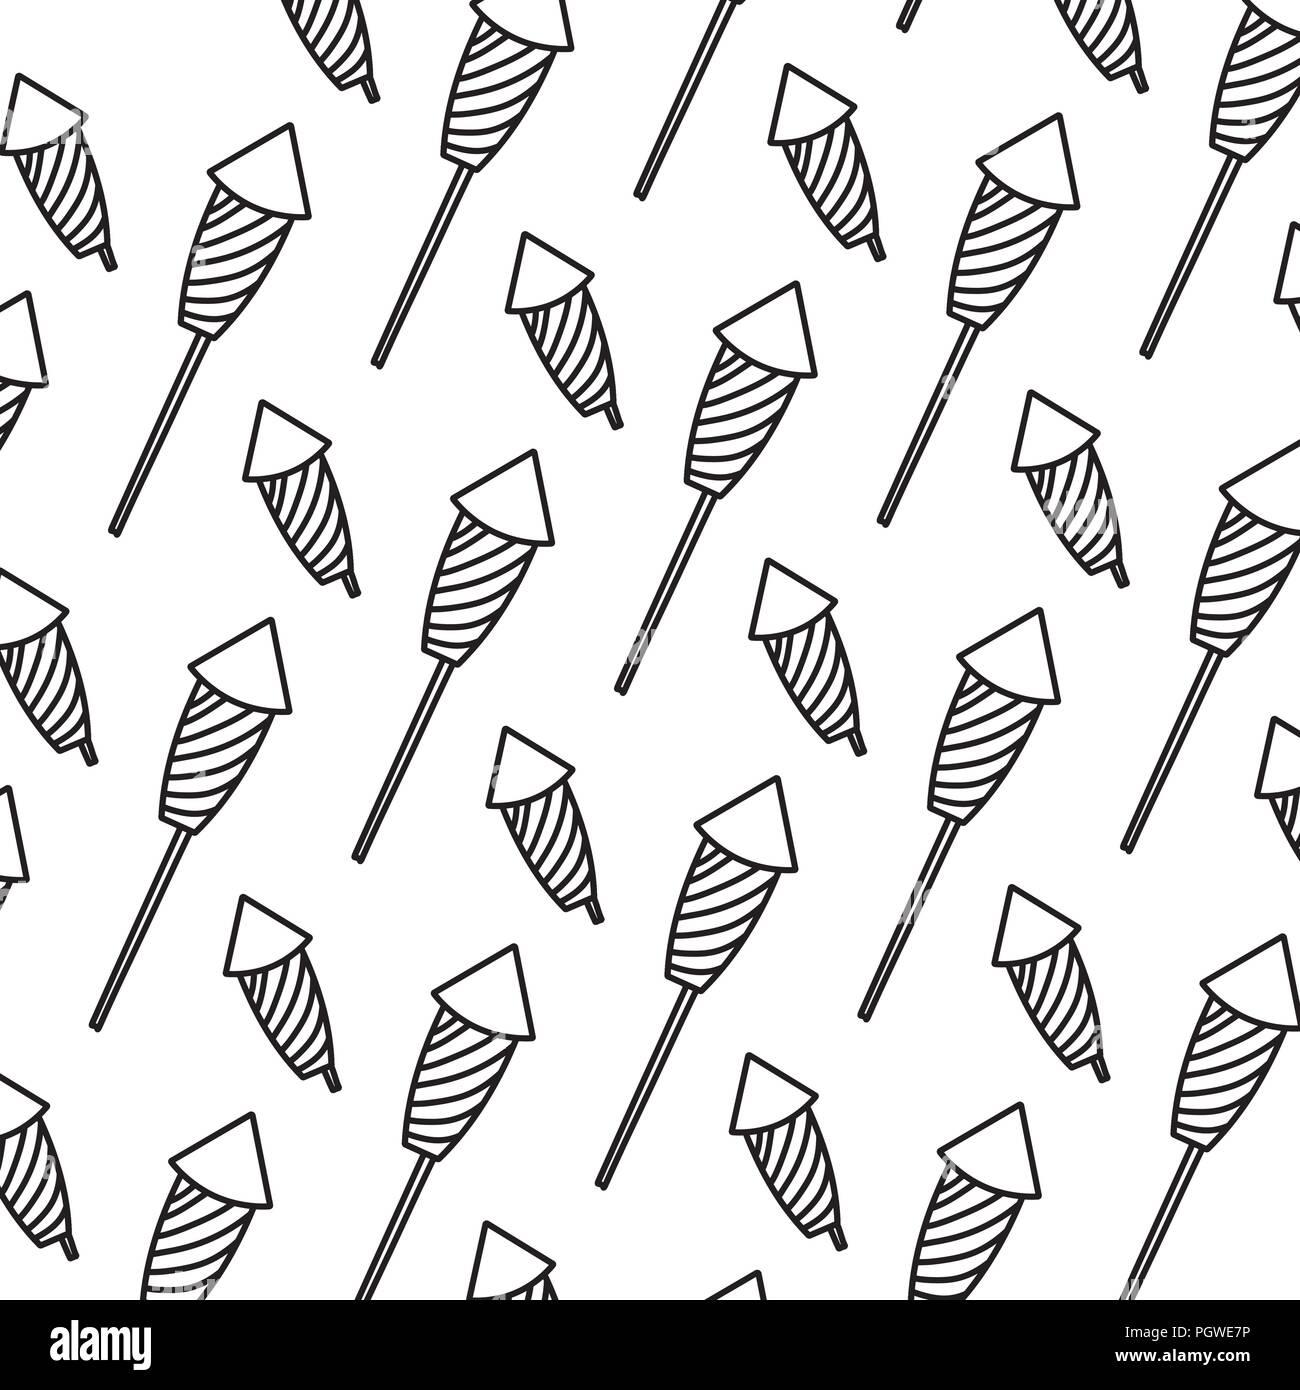 line firework object to celebration holiday background - Stock Image